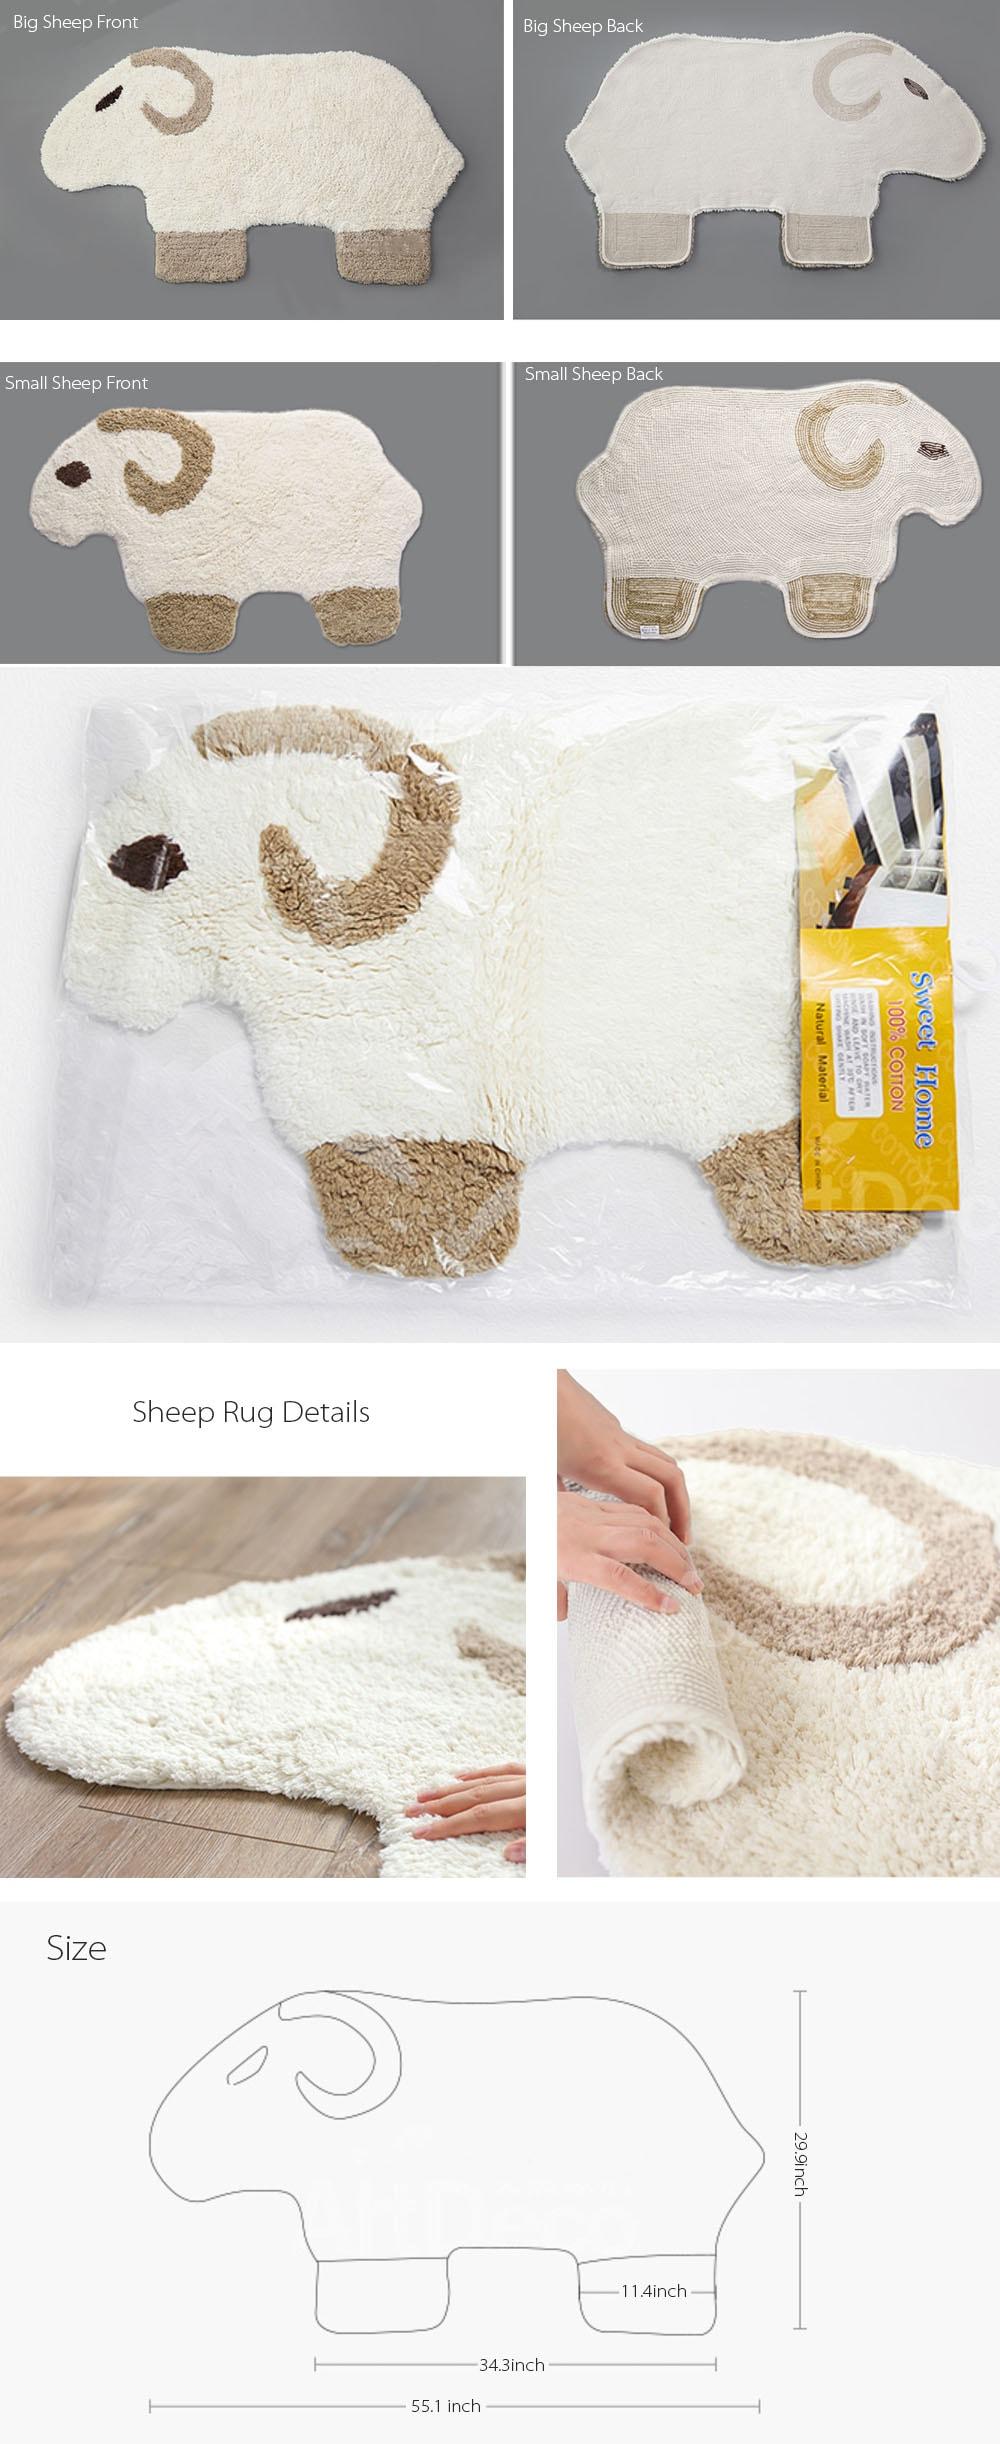 Sheep Shaped Rug Made of Cotton